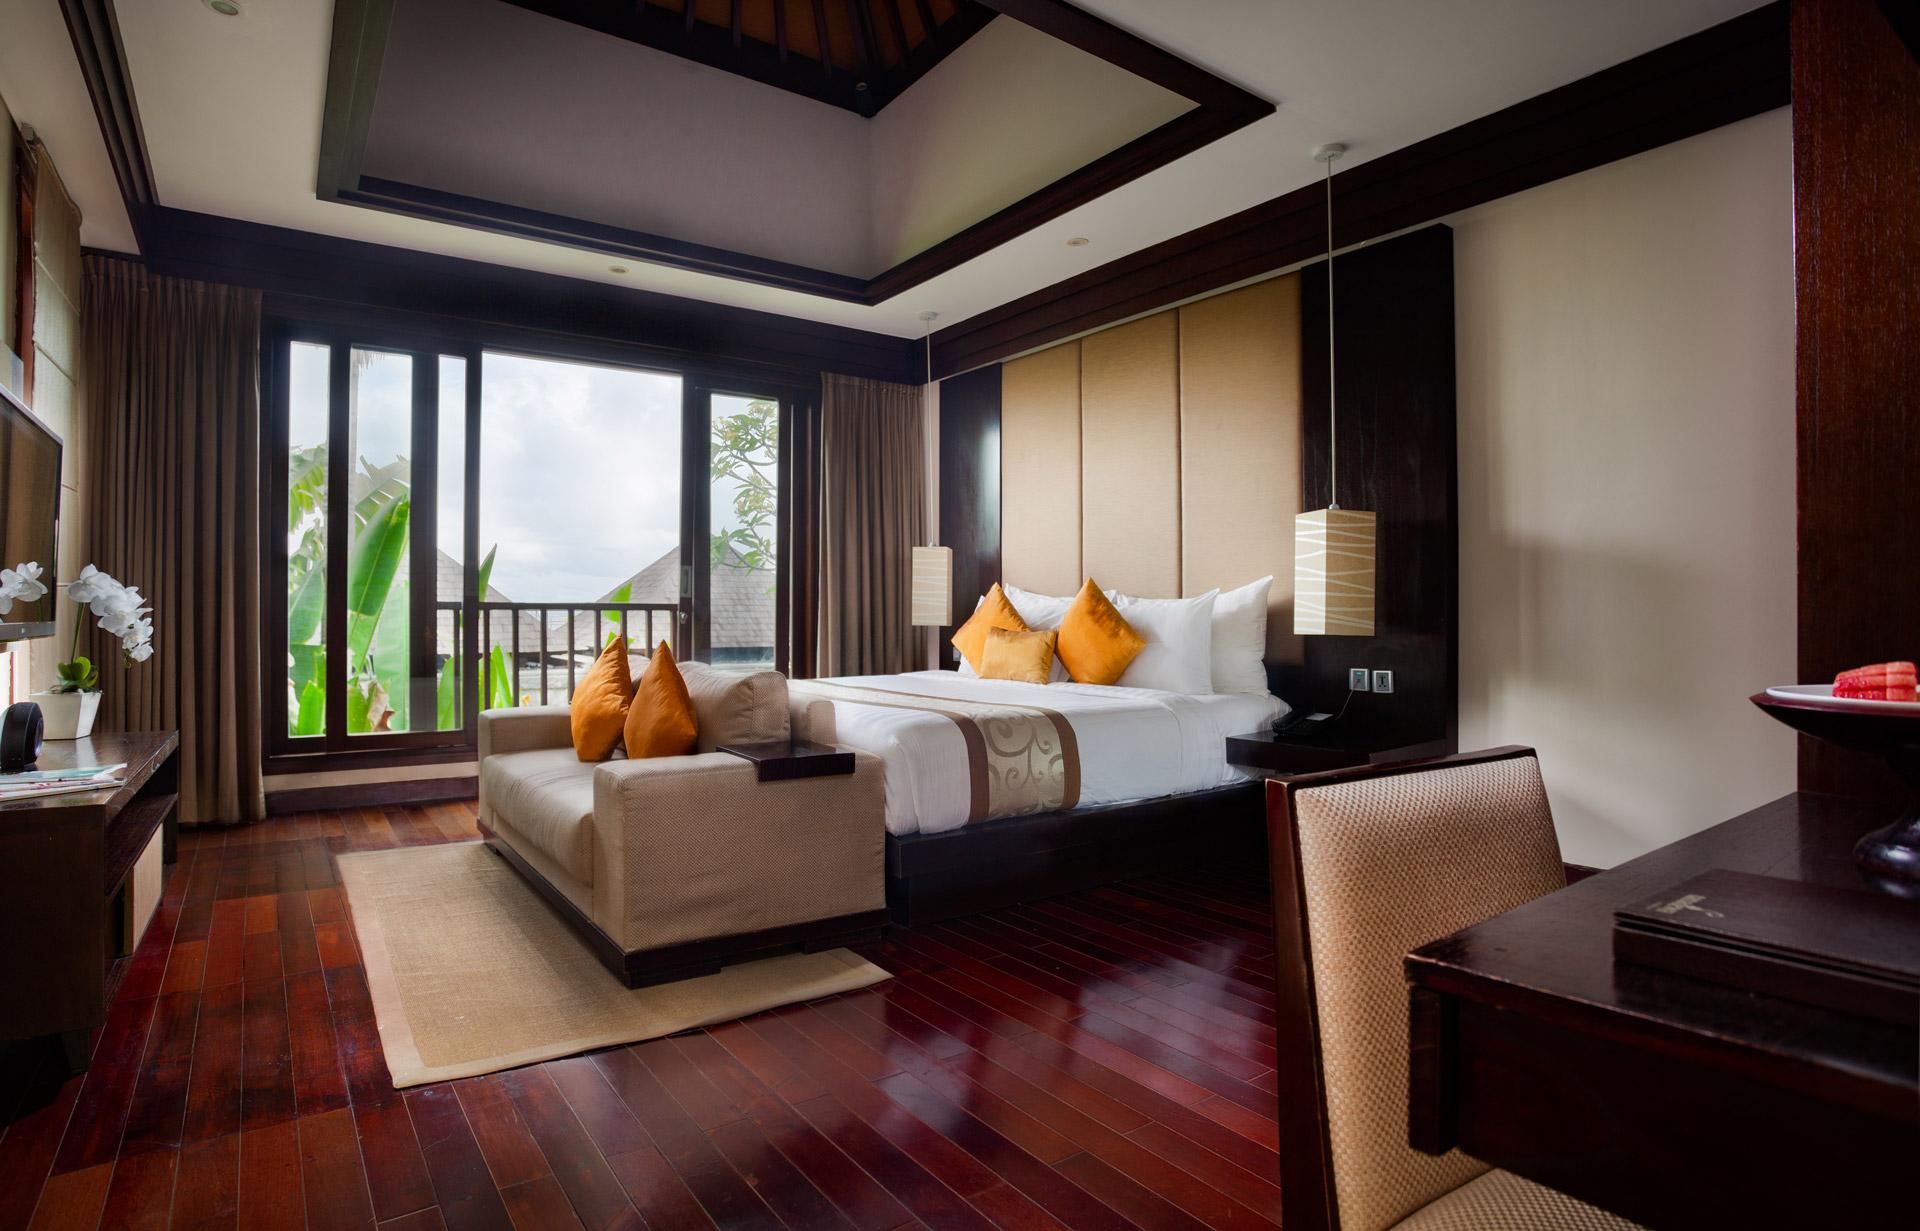 Tanadewa Nusa Dua - One Bedroom Villa Interior Photo